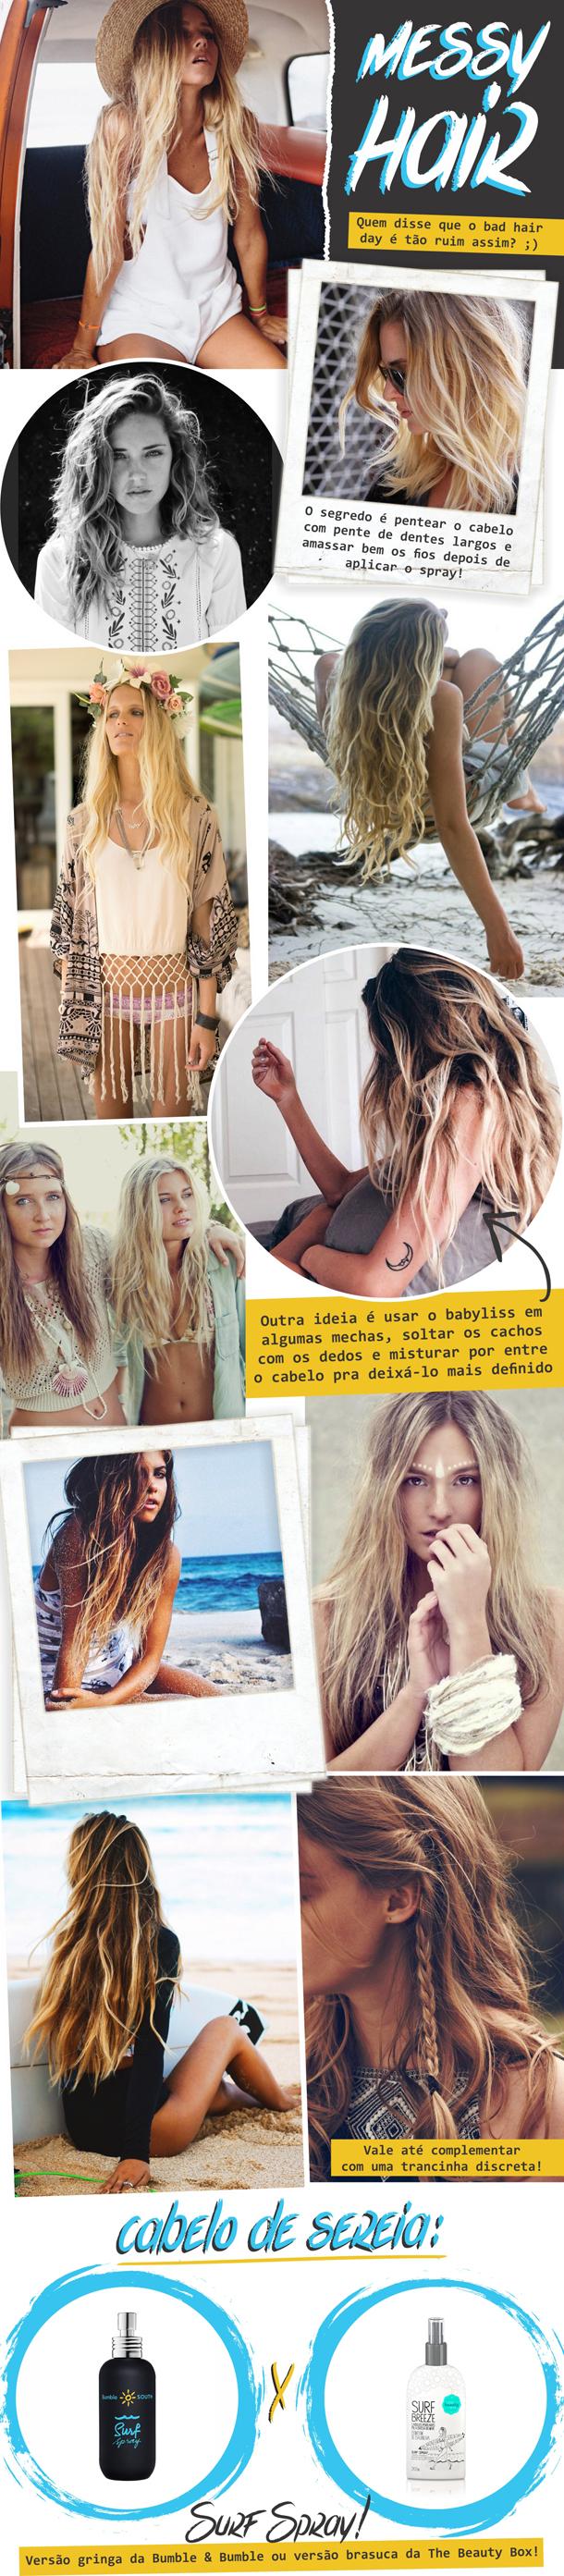 mundo-lolita-messy-hair